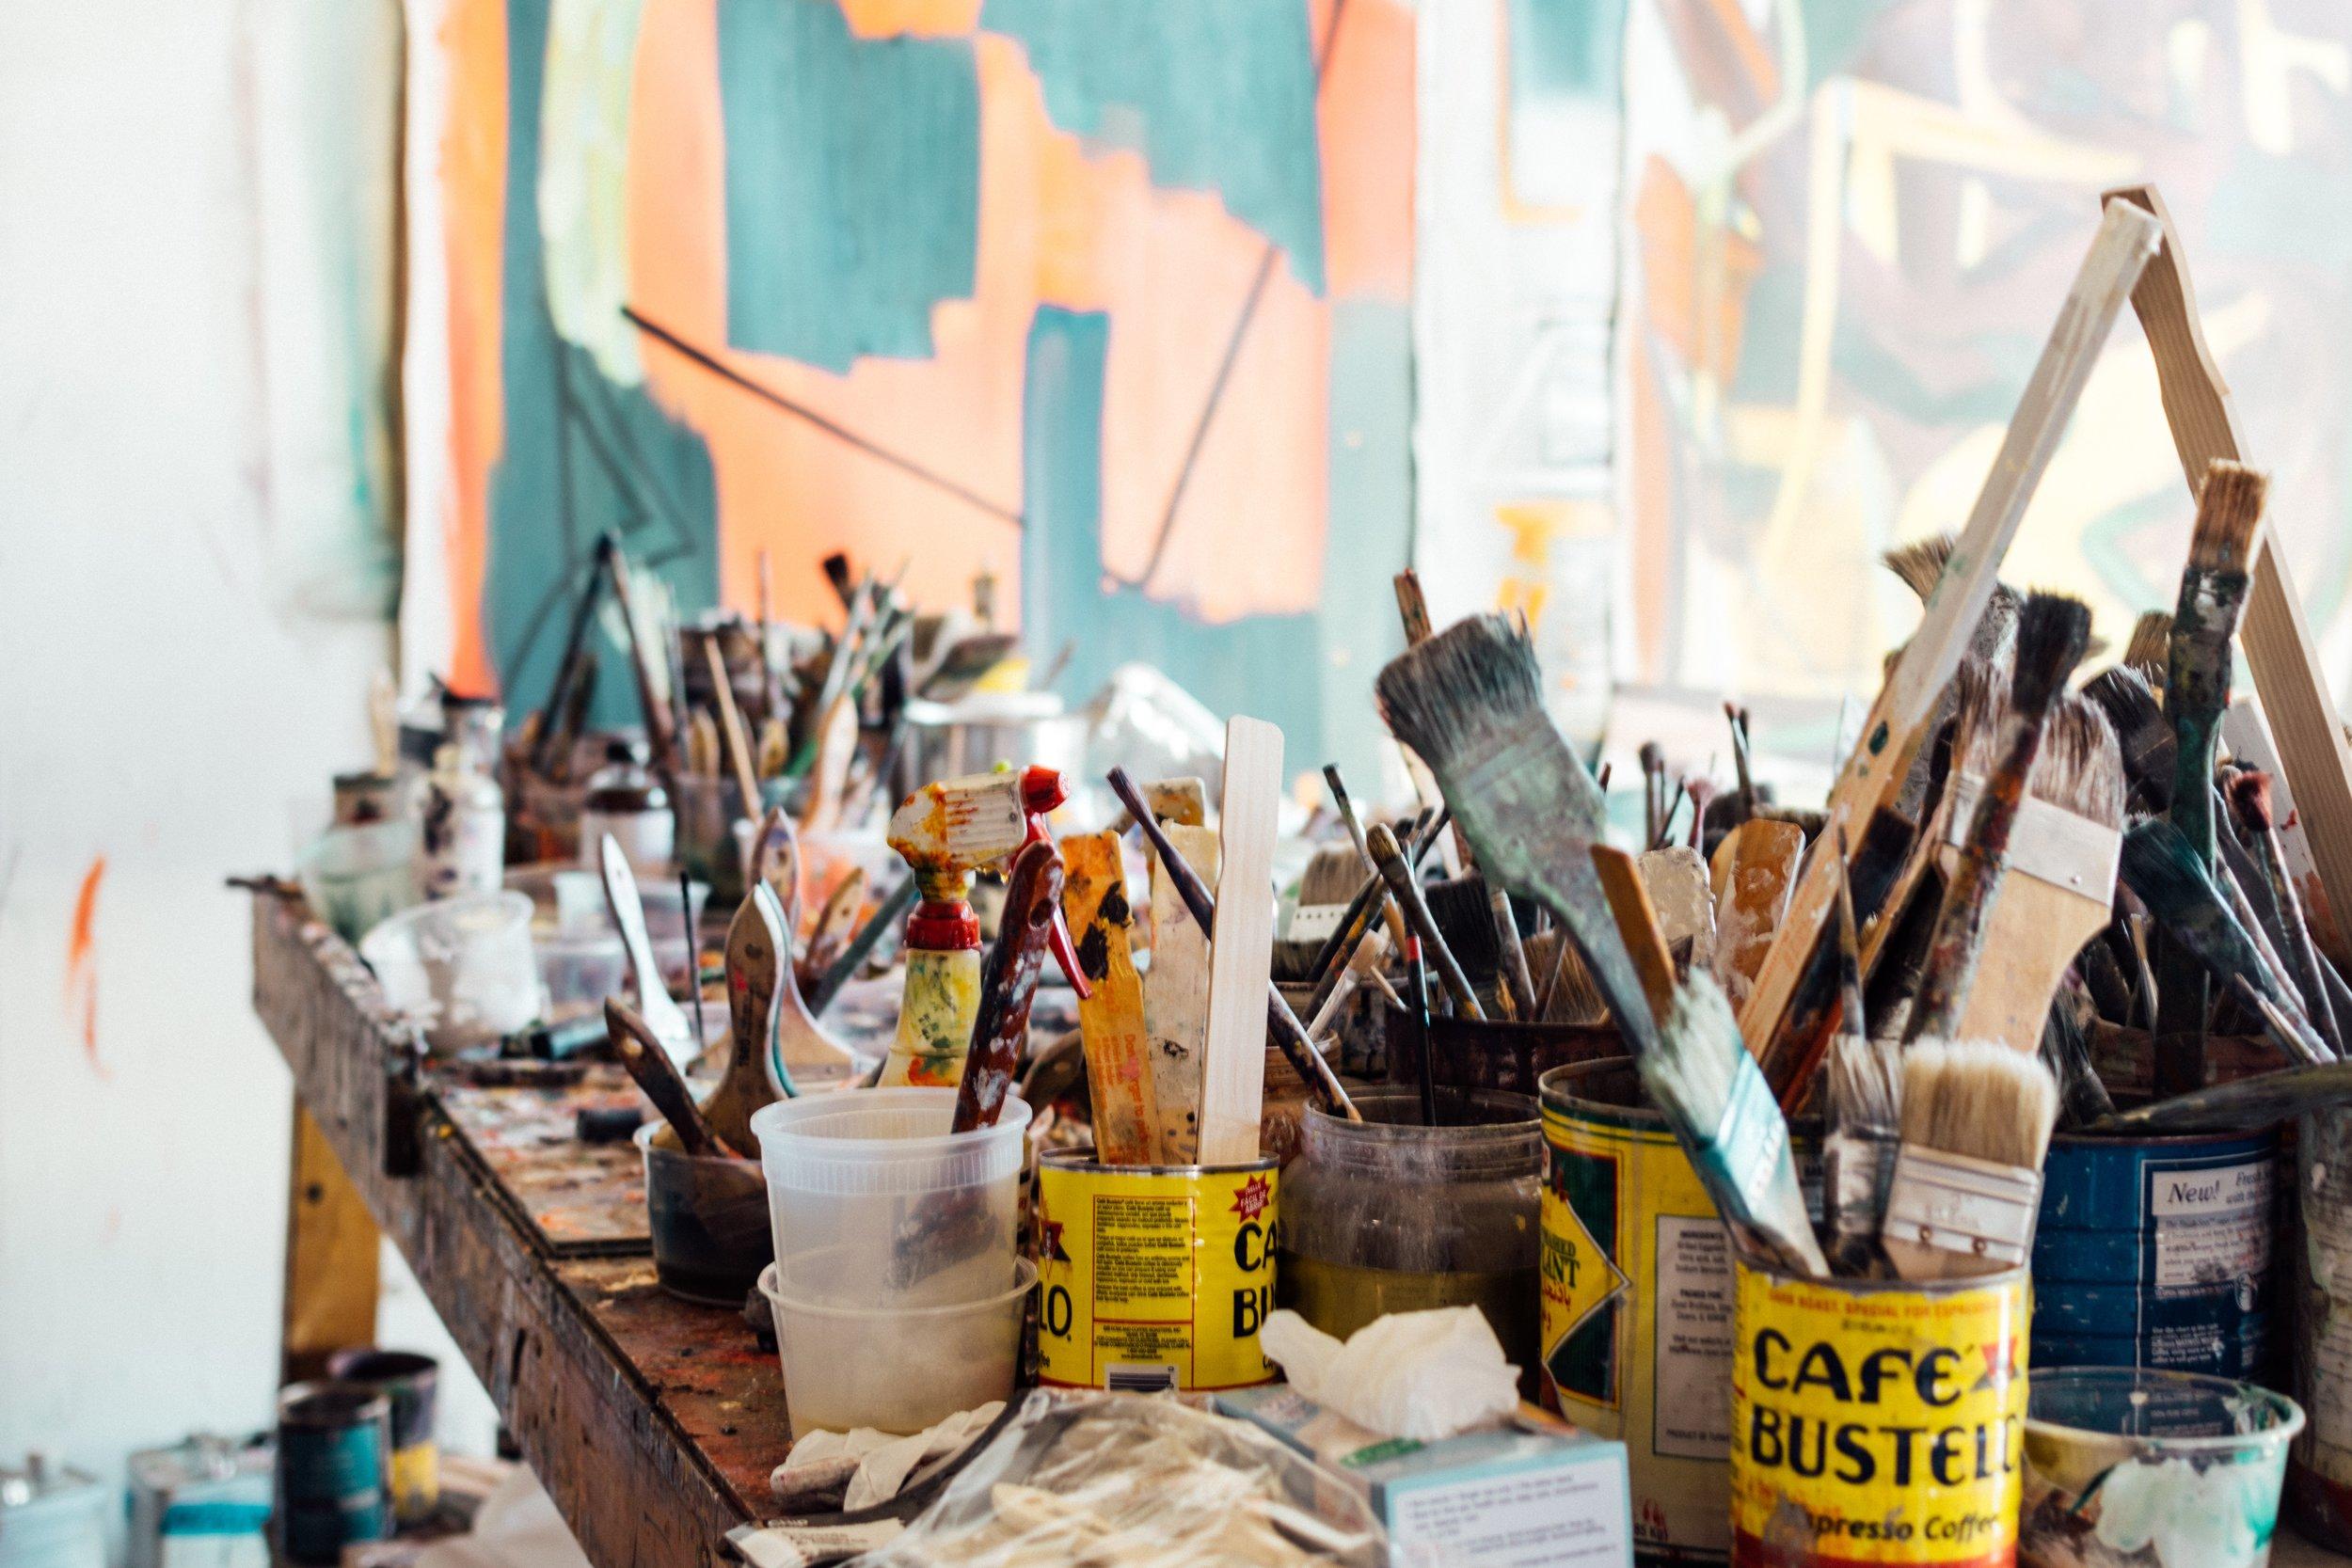 paints-brushes.jpg